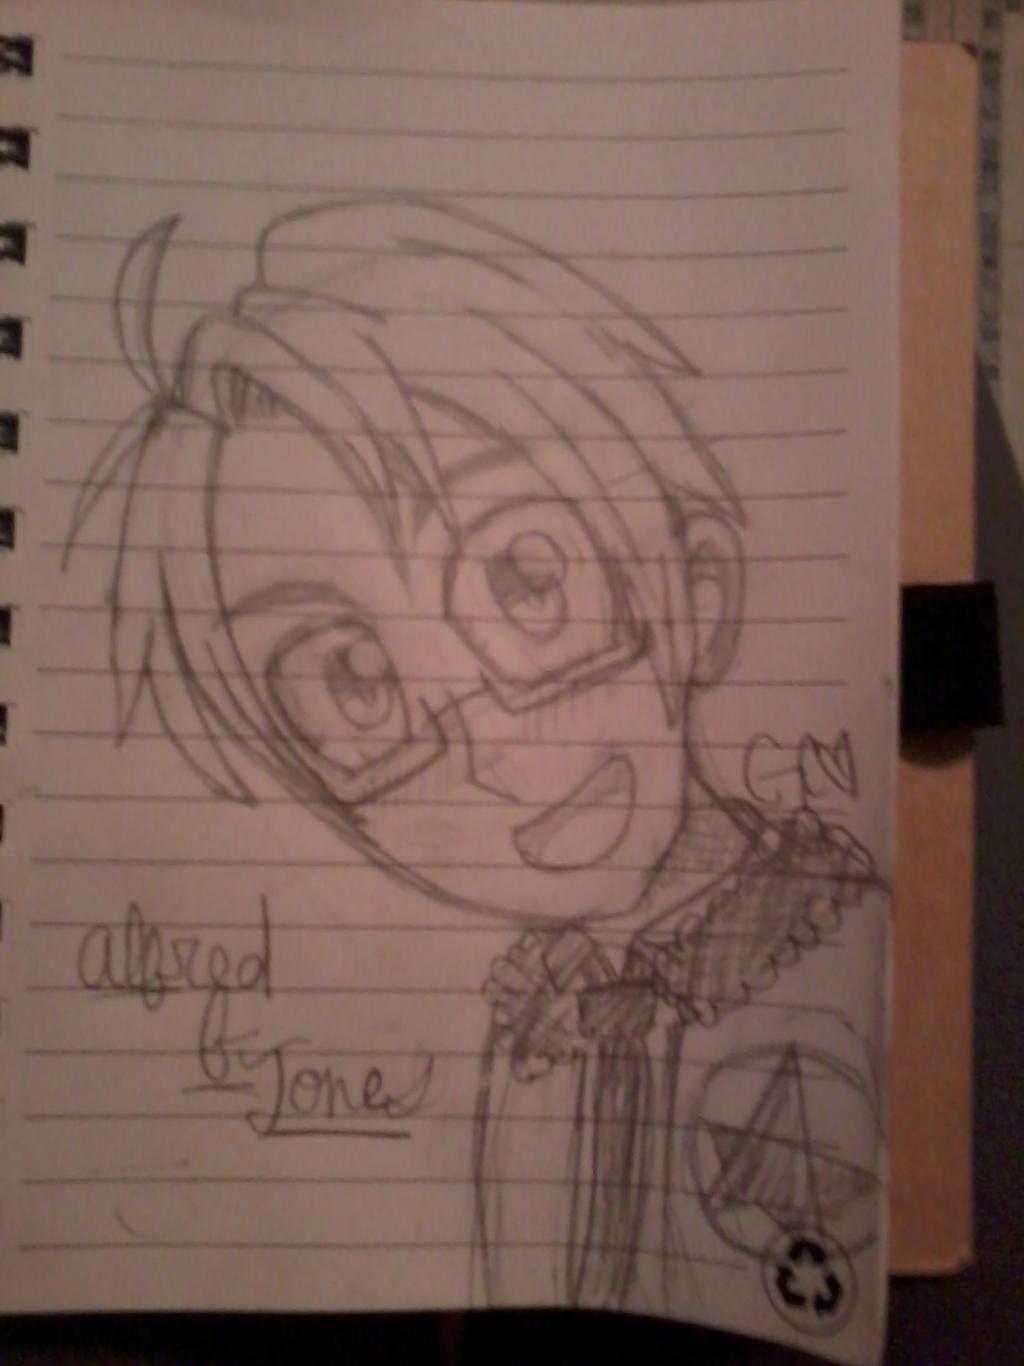 Alfred by Trollan-gurl22